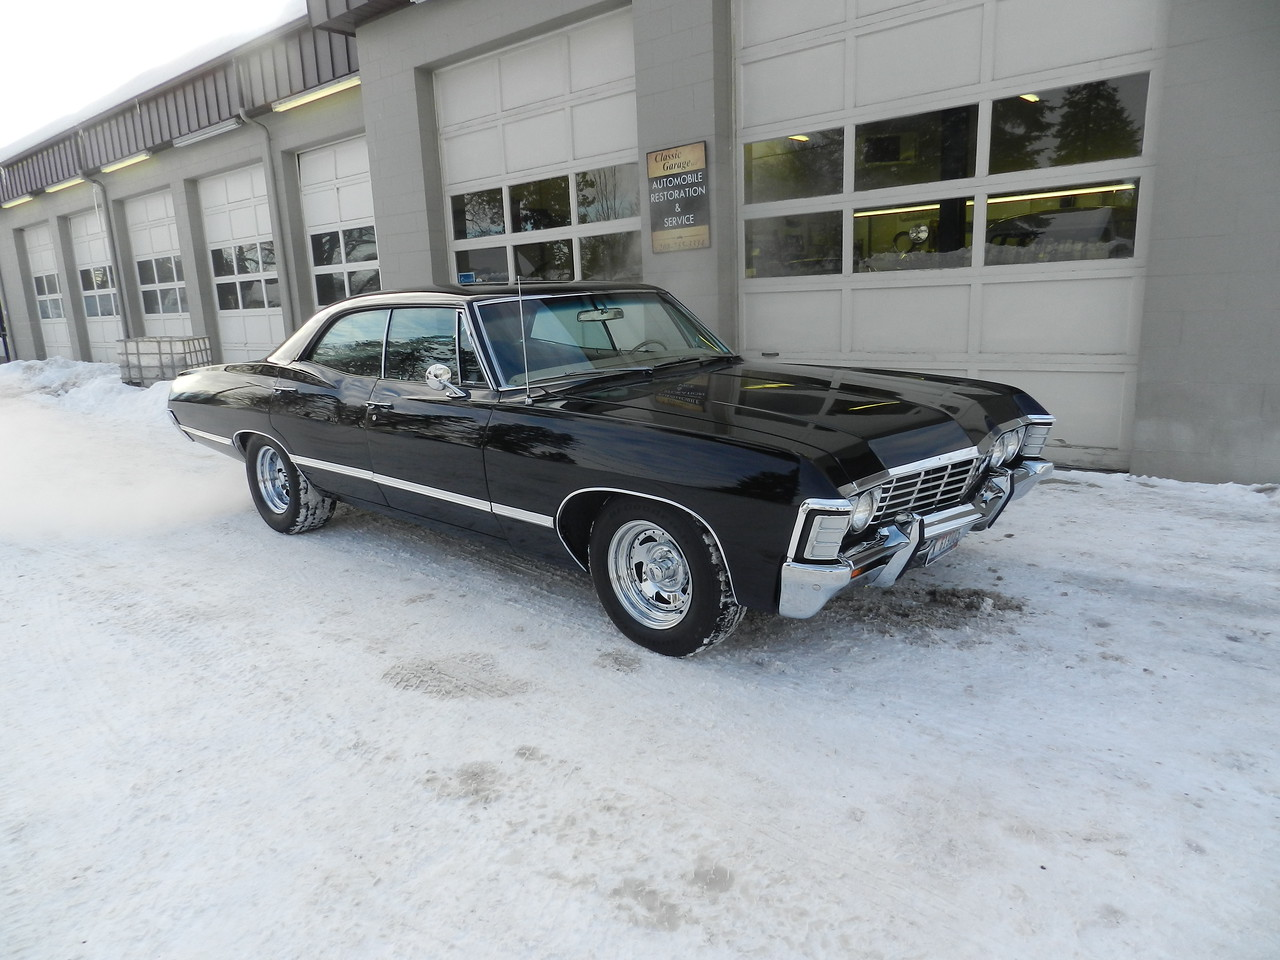 Impala 1967 chevy impala 4 door hardtop for sale : 1967 Chevrolet Impala 4 Door Hardtop - Supernatural Clone Project ...